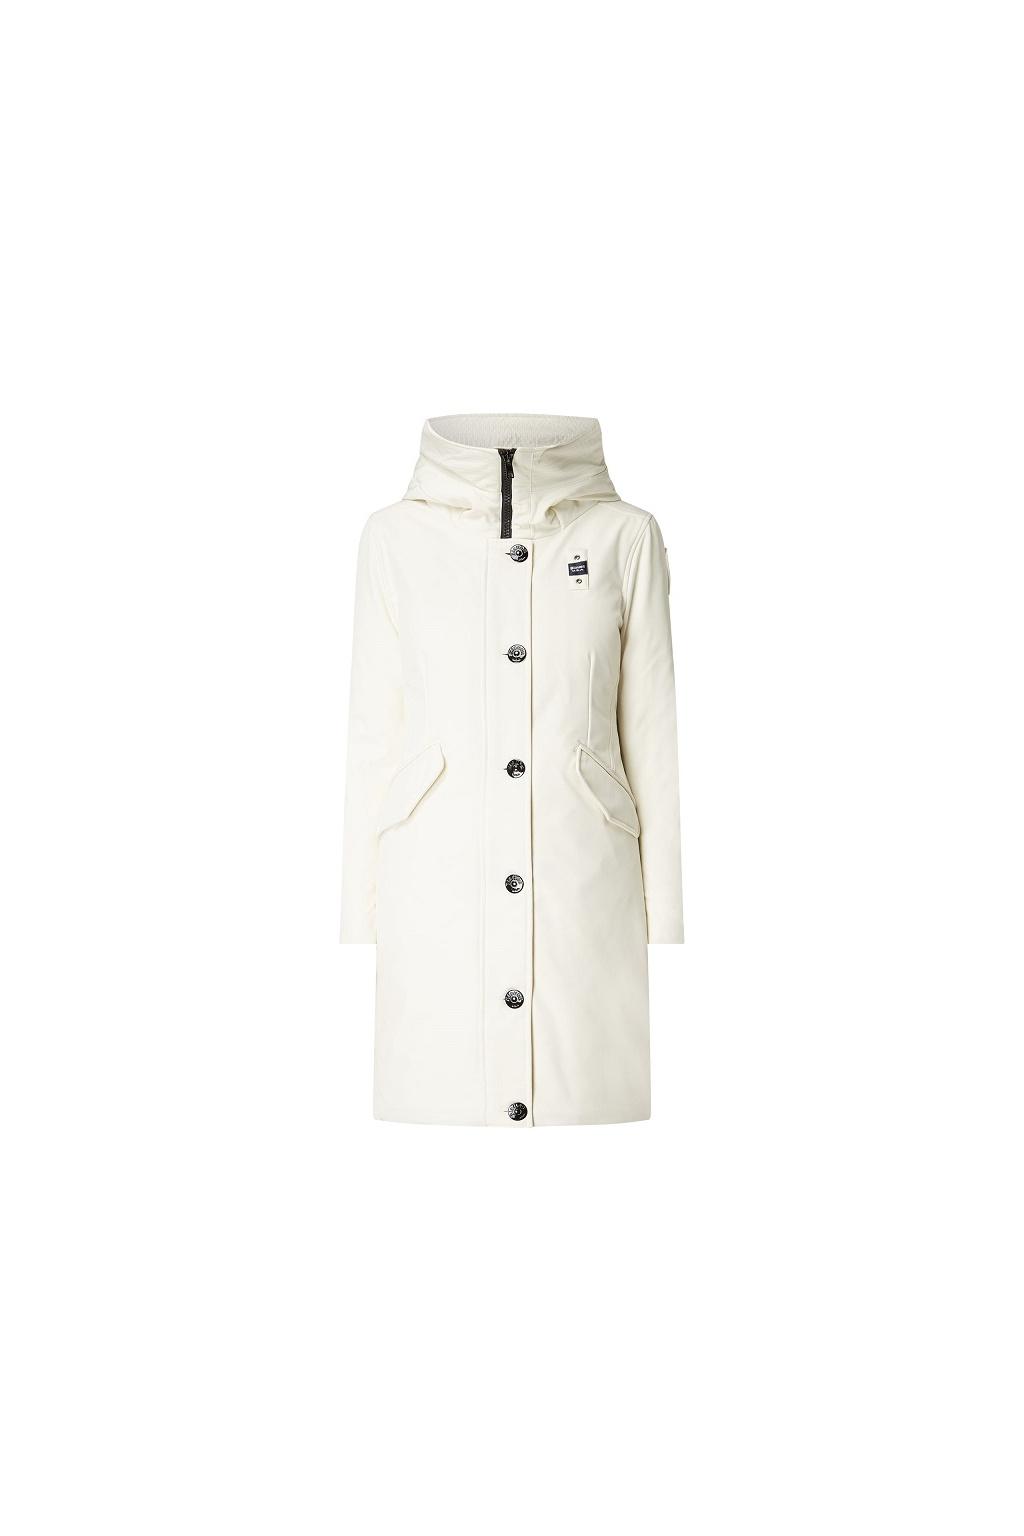 19WBLDK03195 Dámský kabát blauer bílí